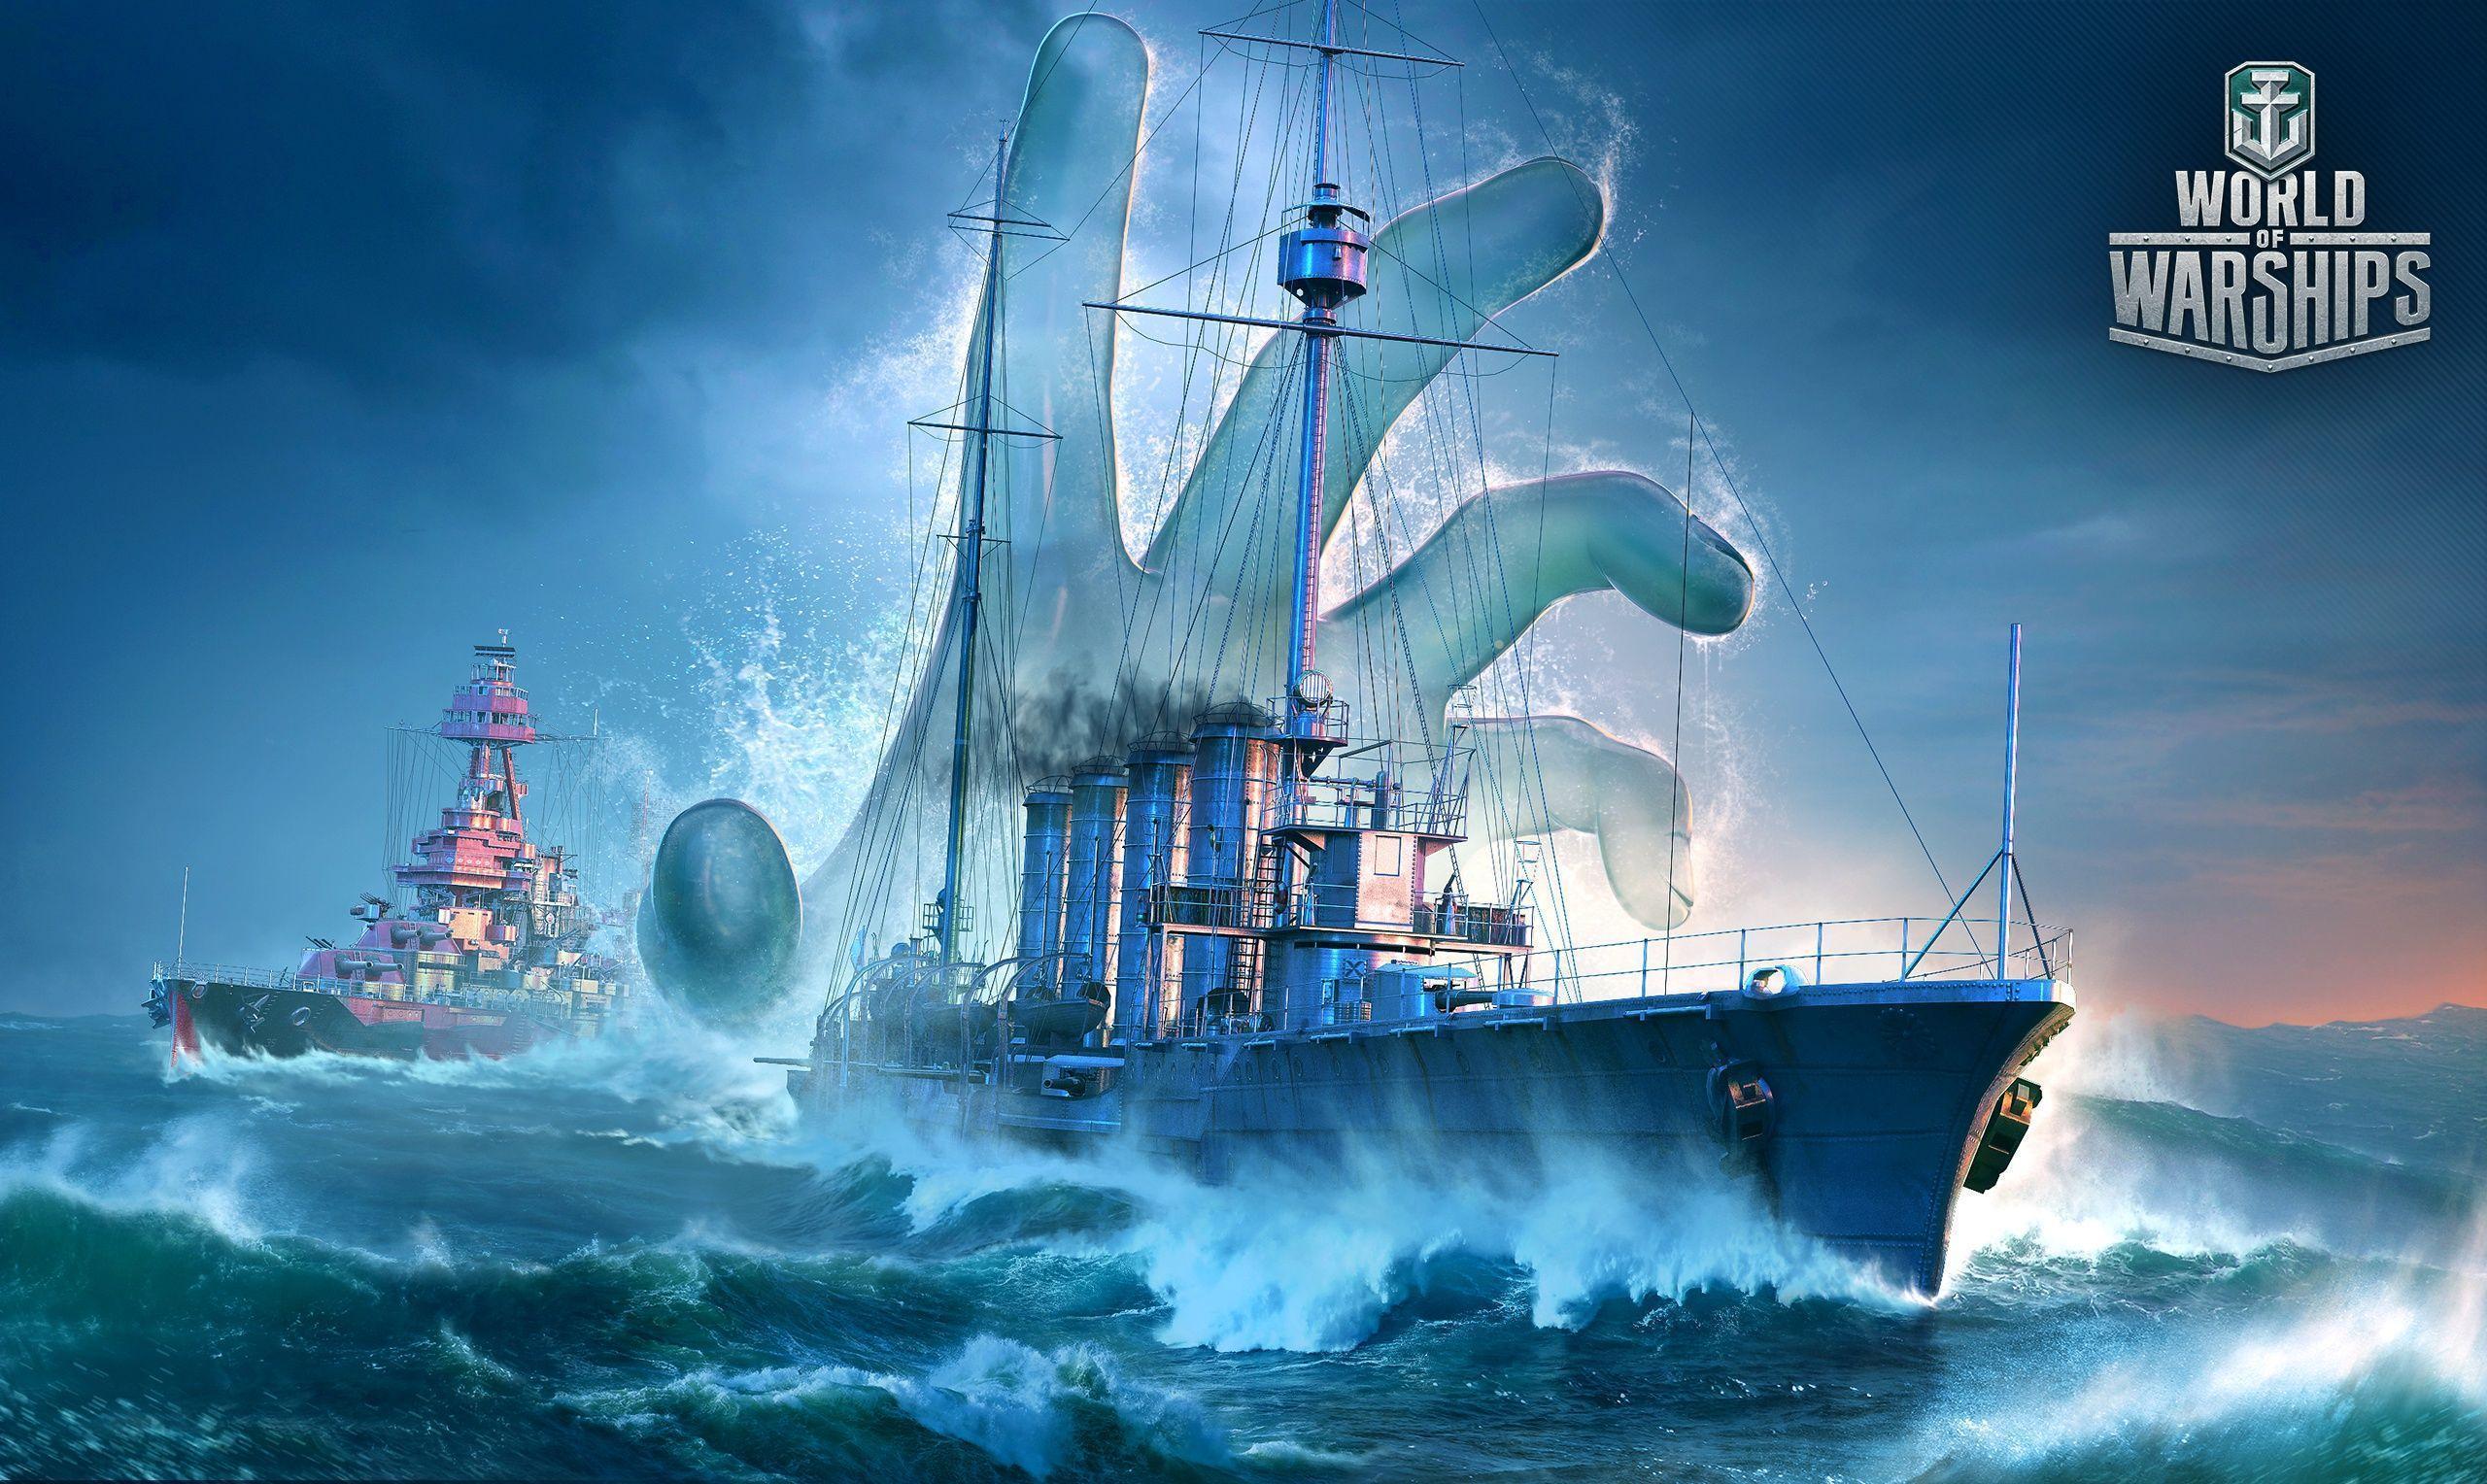 World Of Warships Wallpaper: World Of Warships Wallpapers